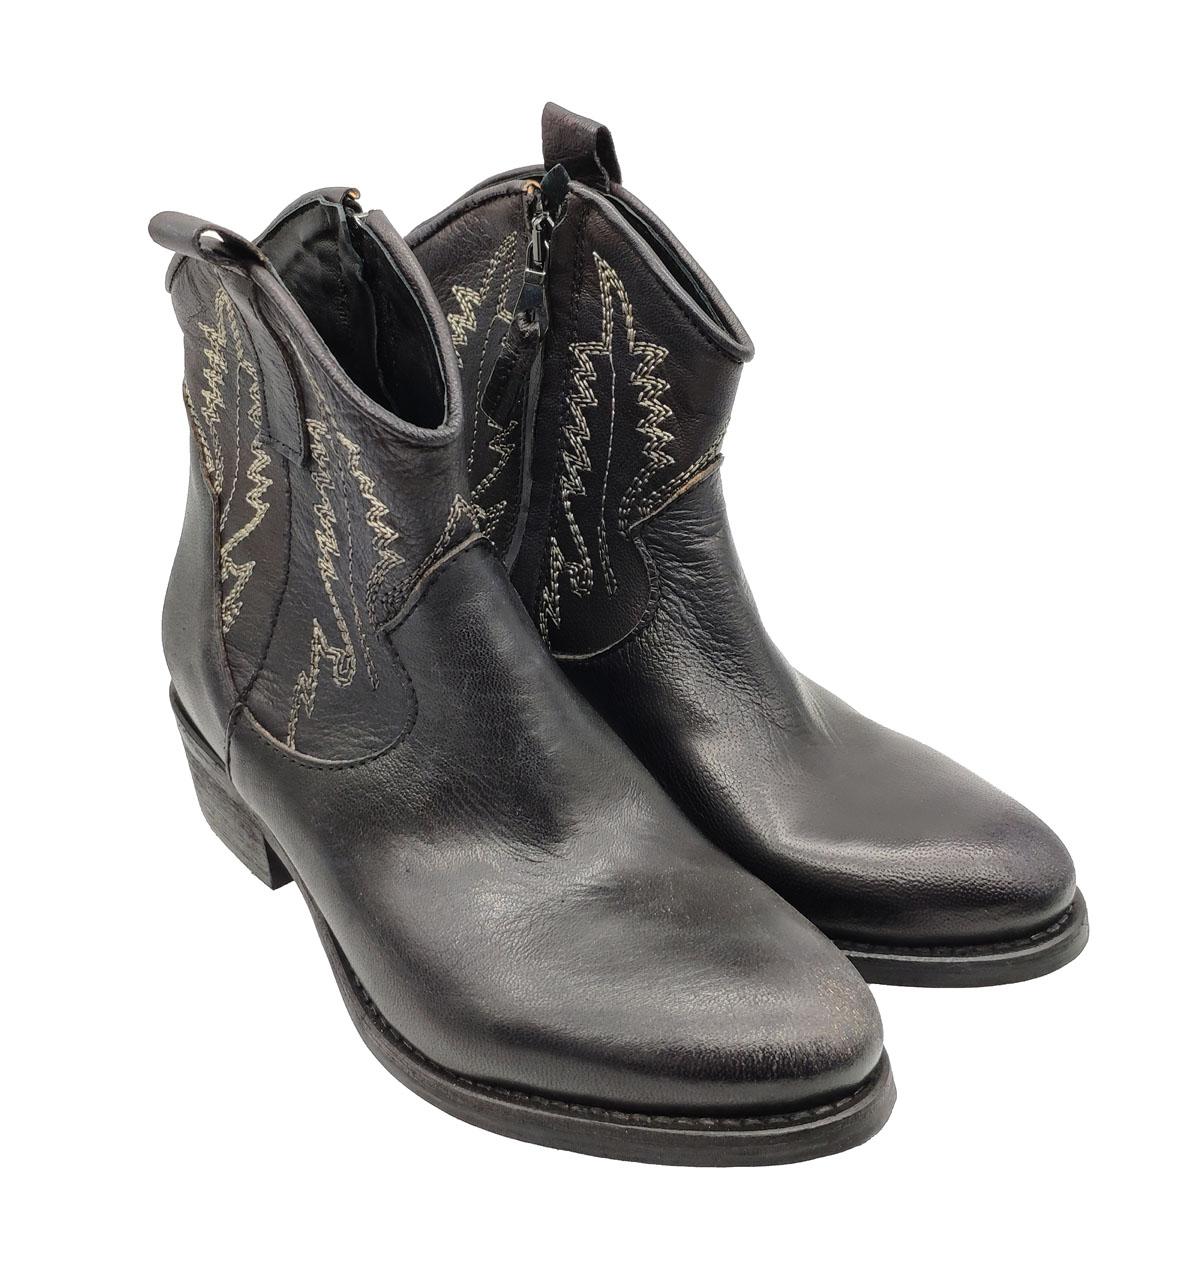 Zoe | Ankle Boots | TEXR2NERO